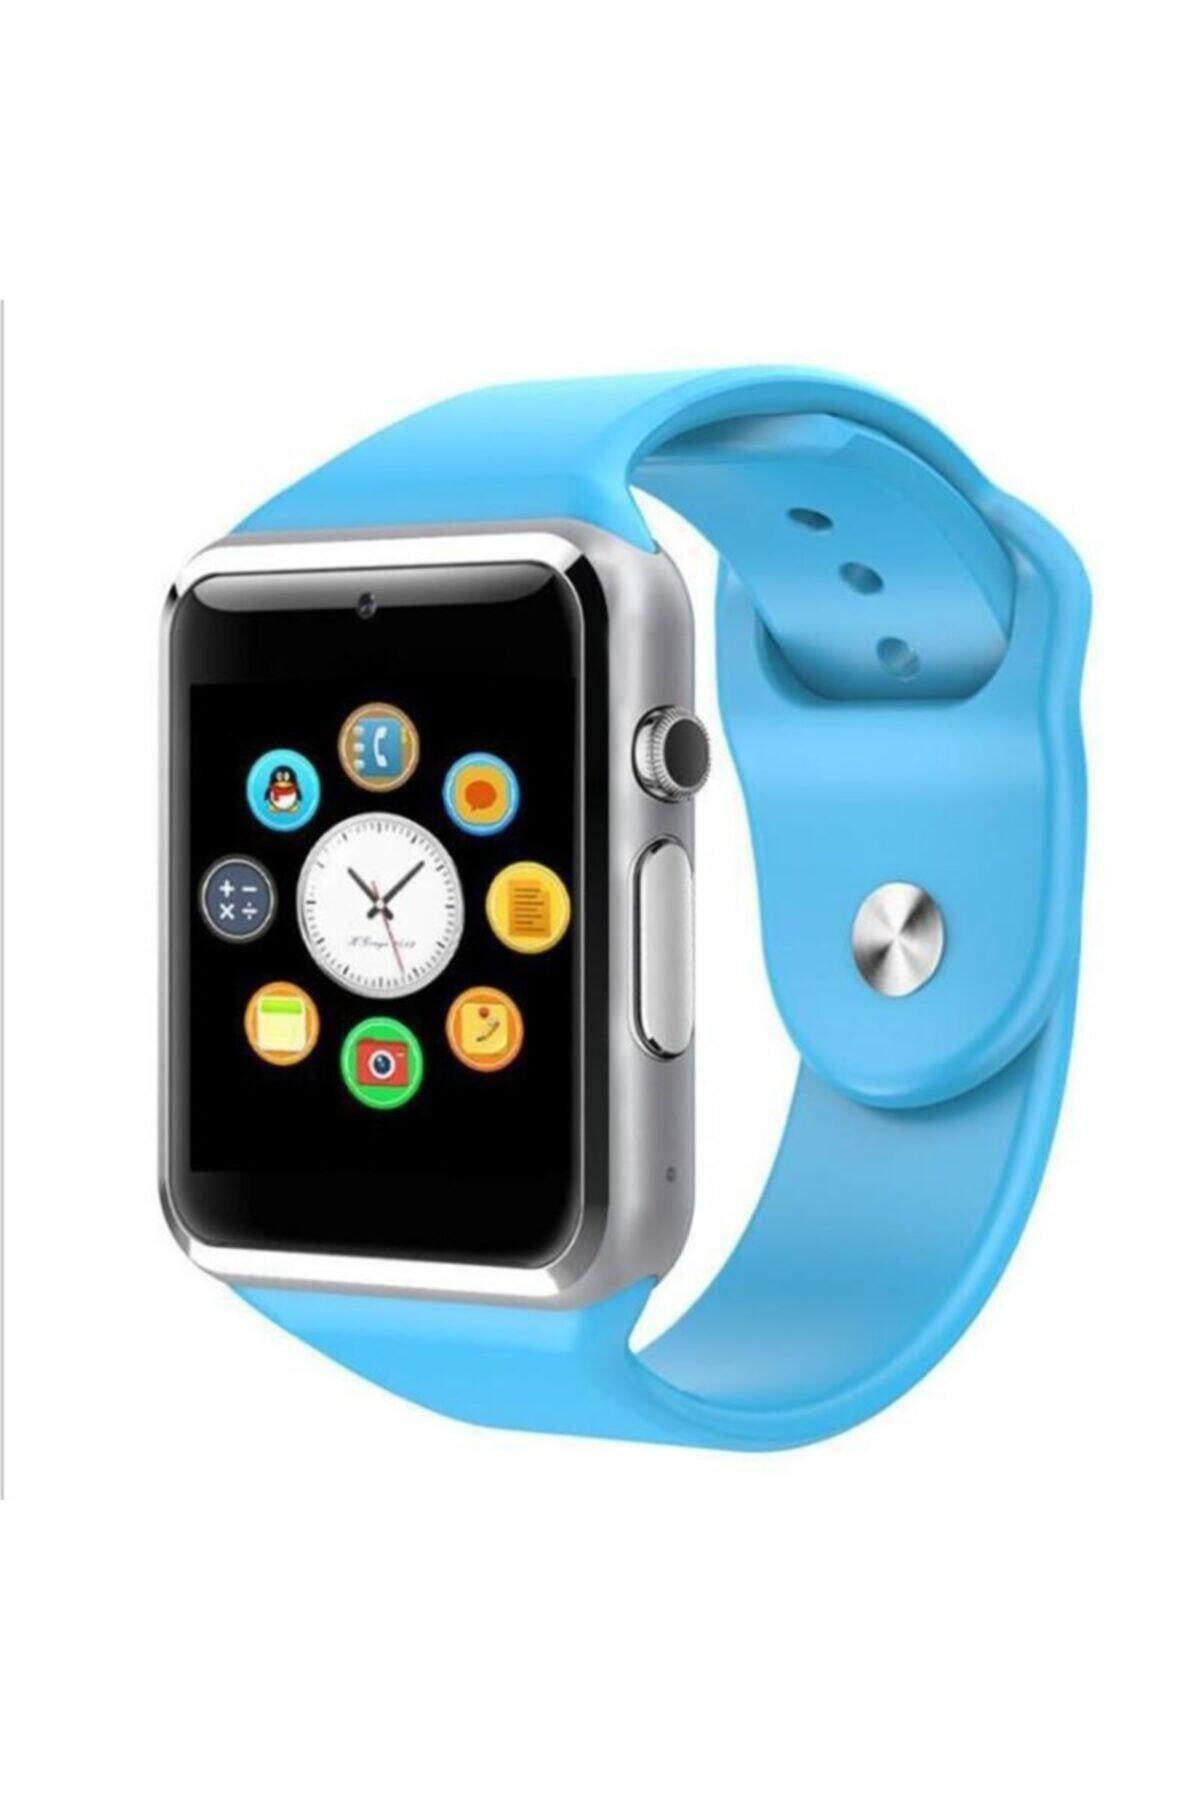 Smart Wacht Akıllı Çocuk Saati A1 2020 Bluetooth Kameralı Sim Kartlı Türkçe Menü